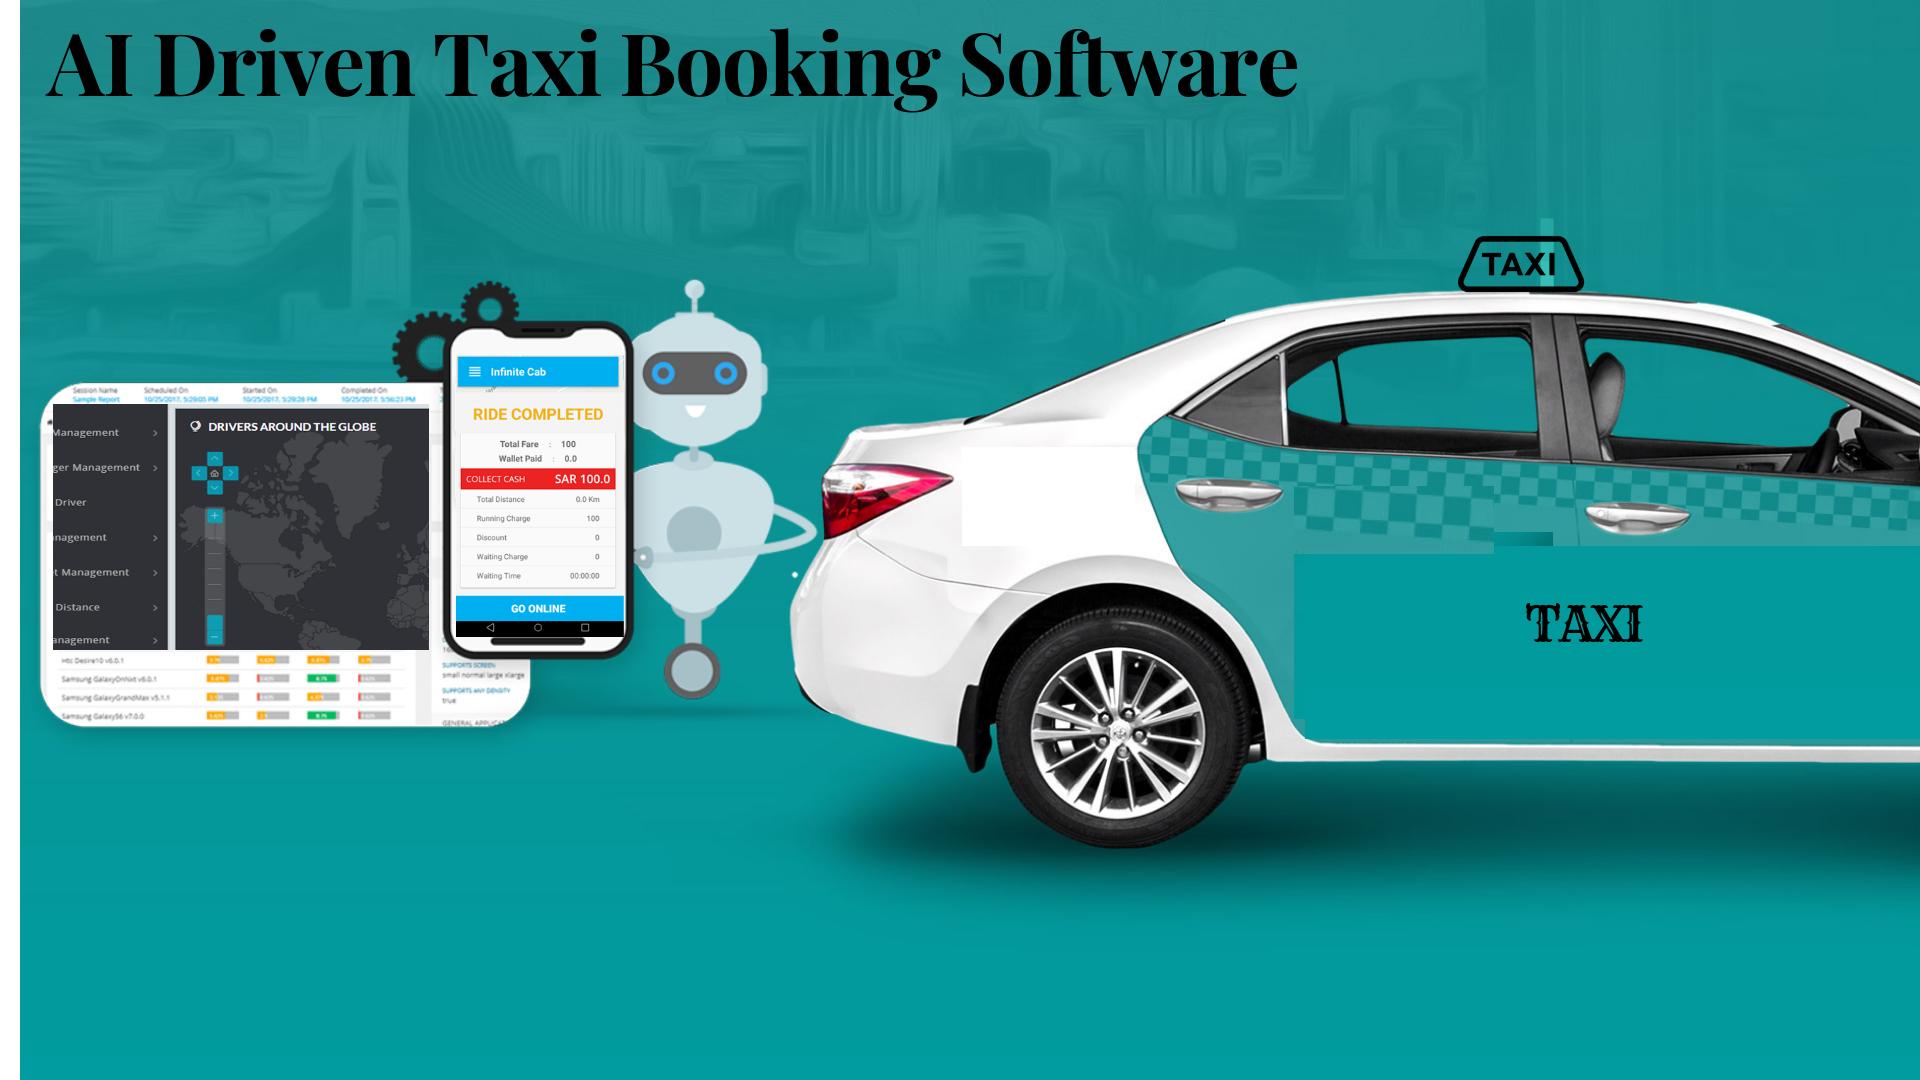 AI Driven Taxi Software